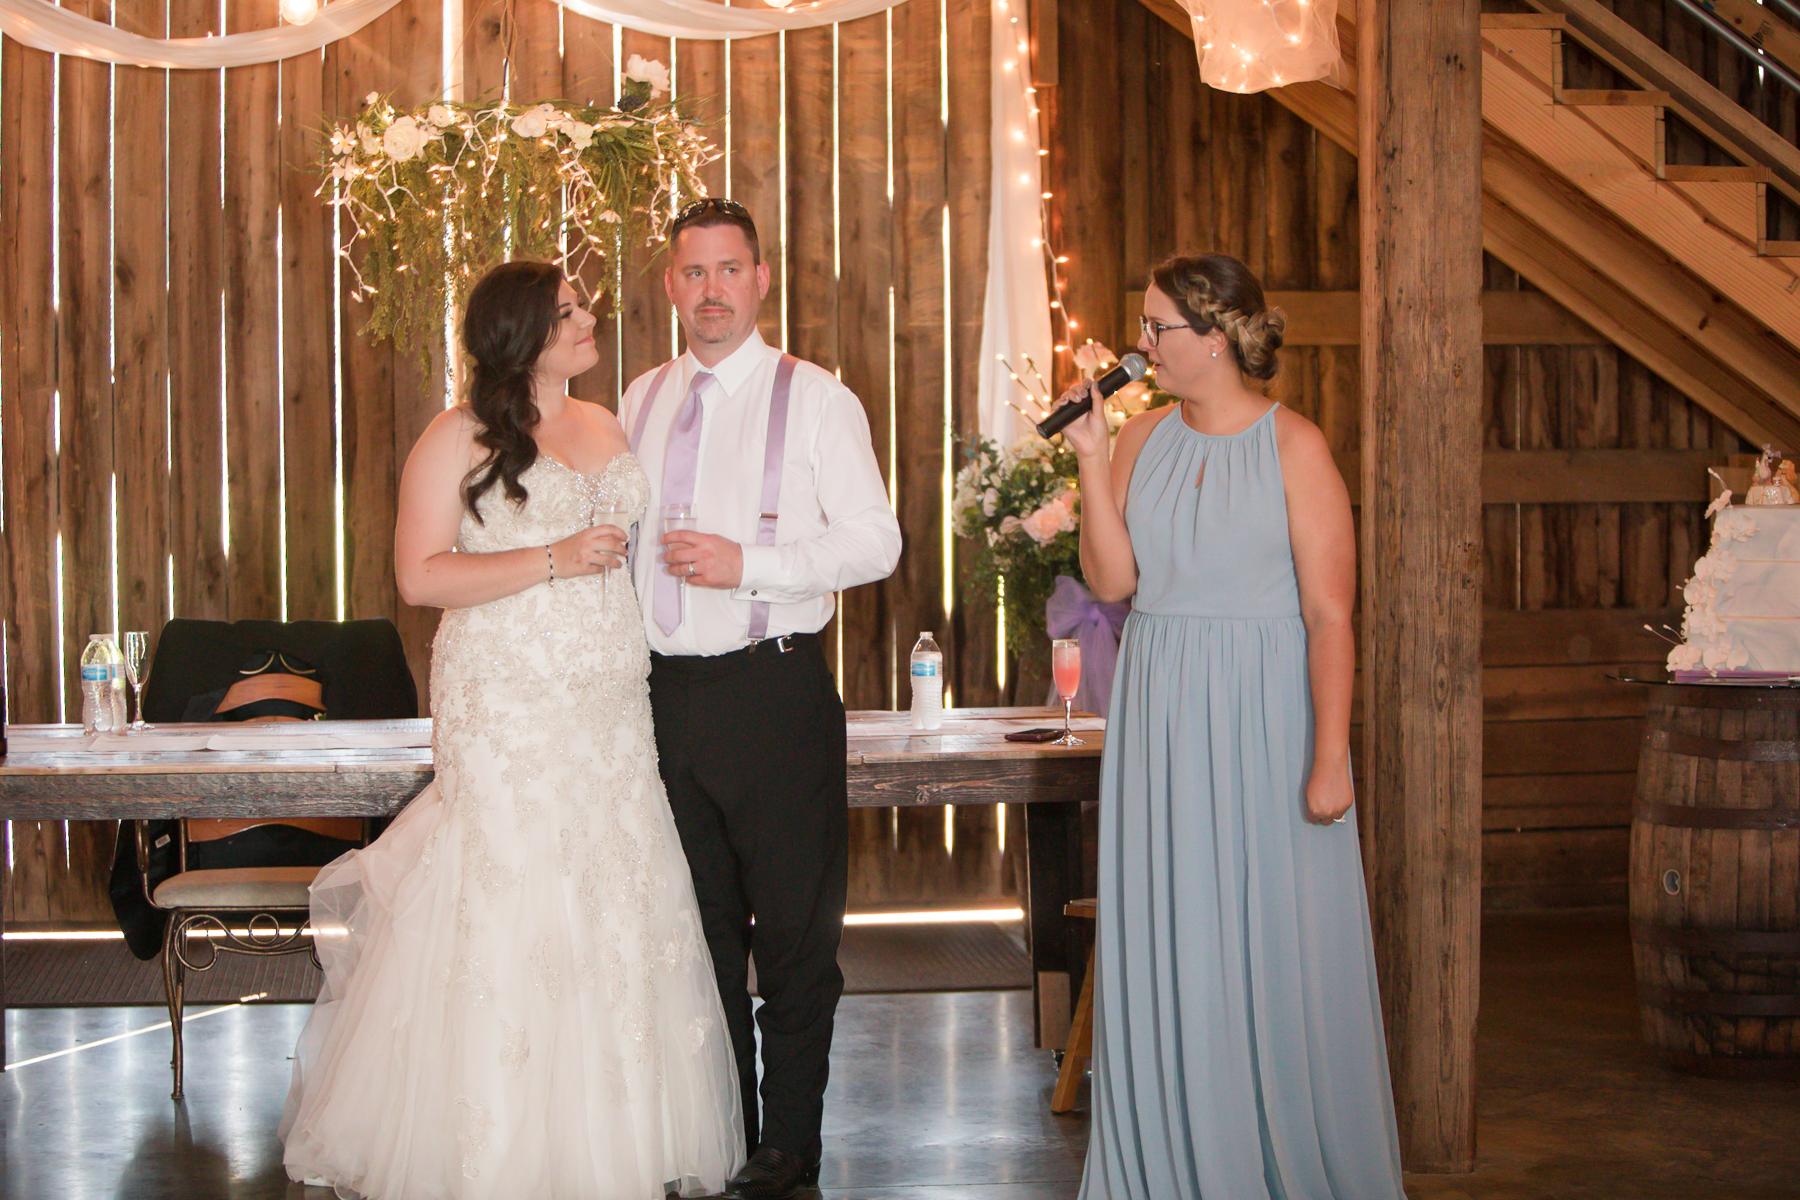 wedding-reception-toasts.jpg